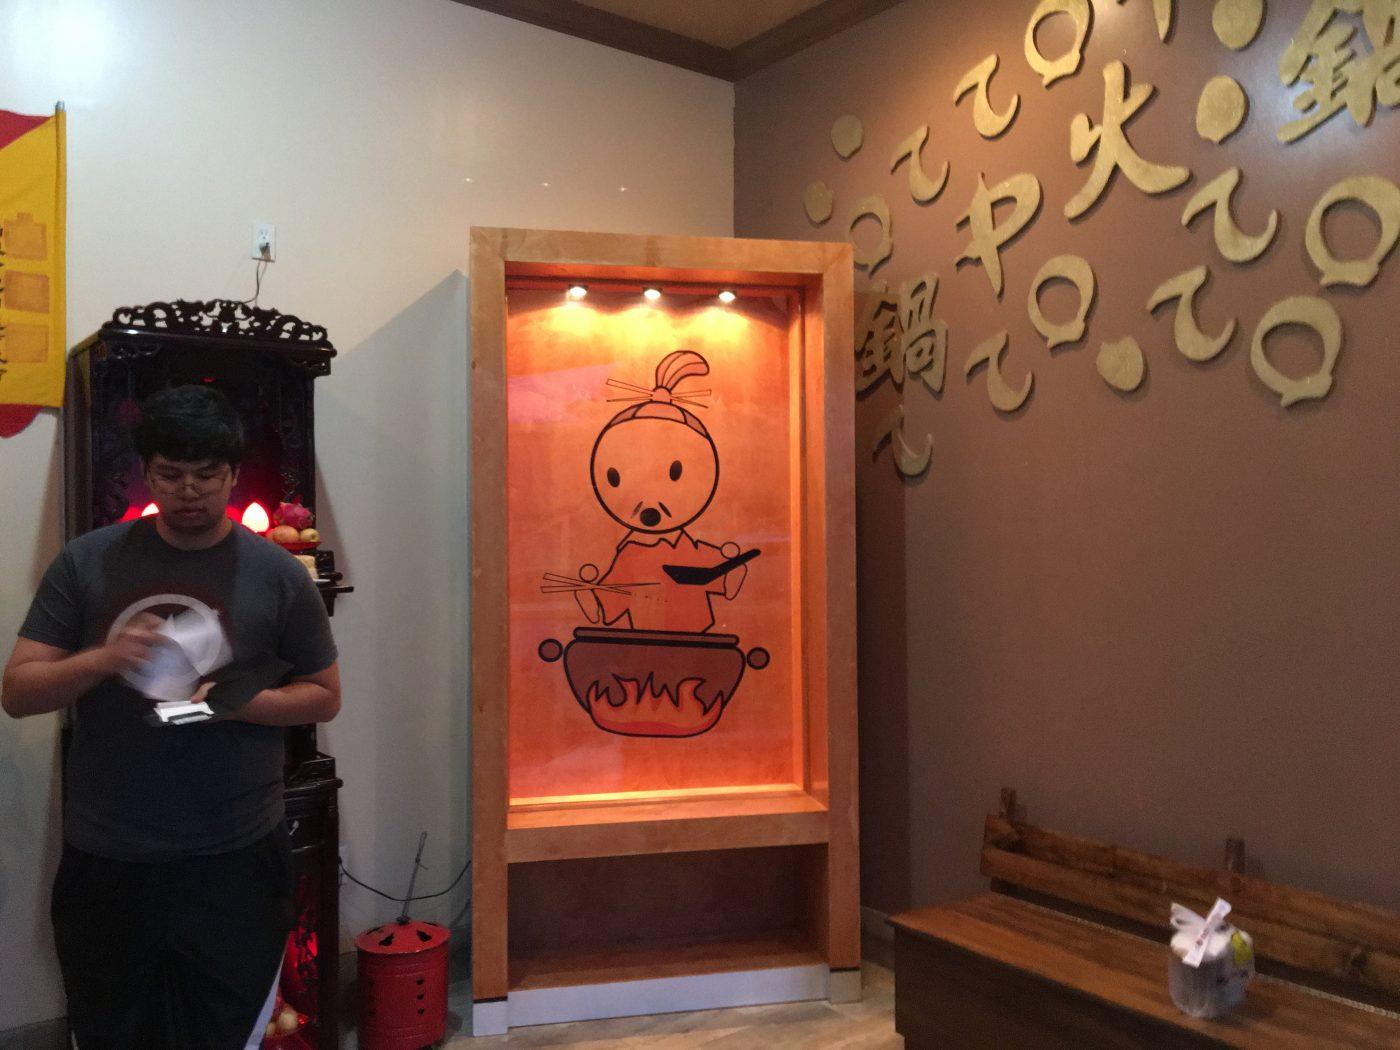 Love that Hotto Potto figure. Hotto Potto at its new location 1700 N. Semoran Blvd, #118, Orlando, FL 32807, 407-930-5366 (credit: Windermere Sun-Susan Sun Nunamaker)